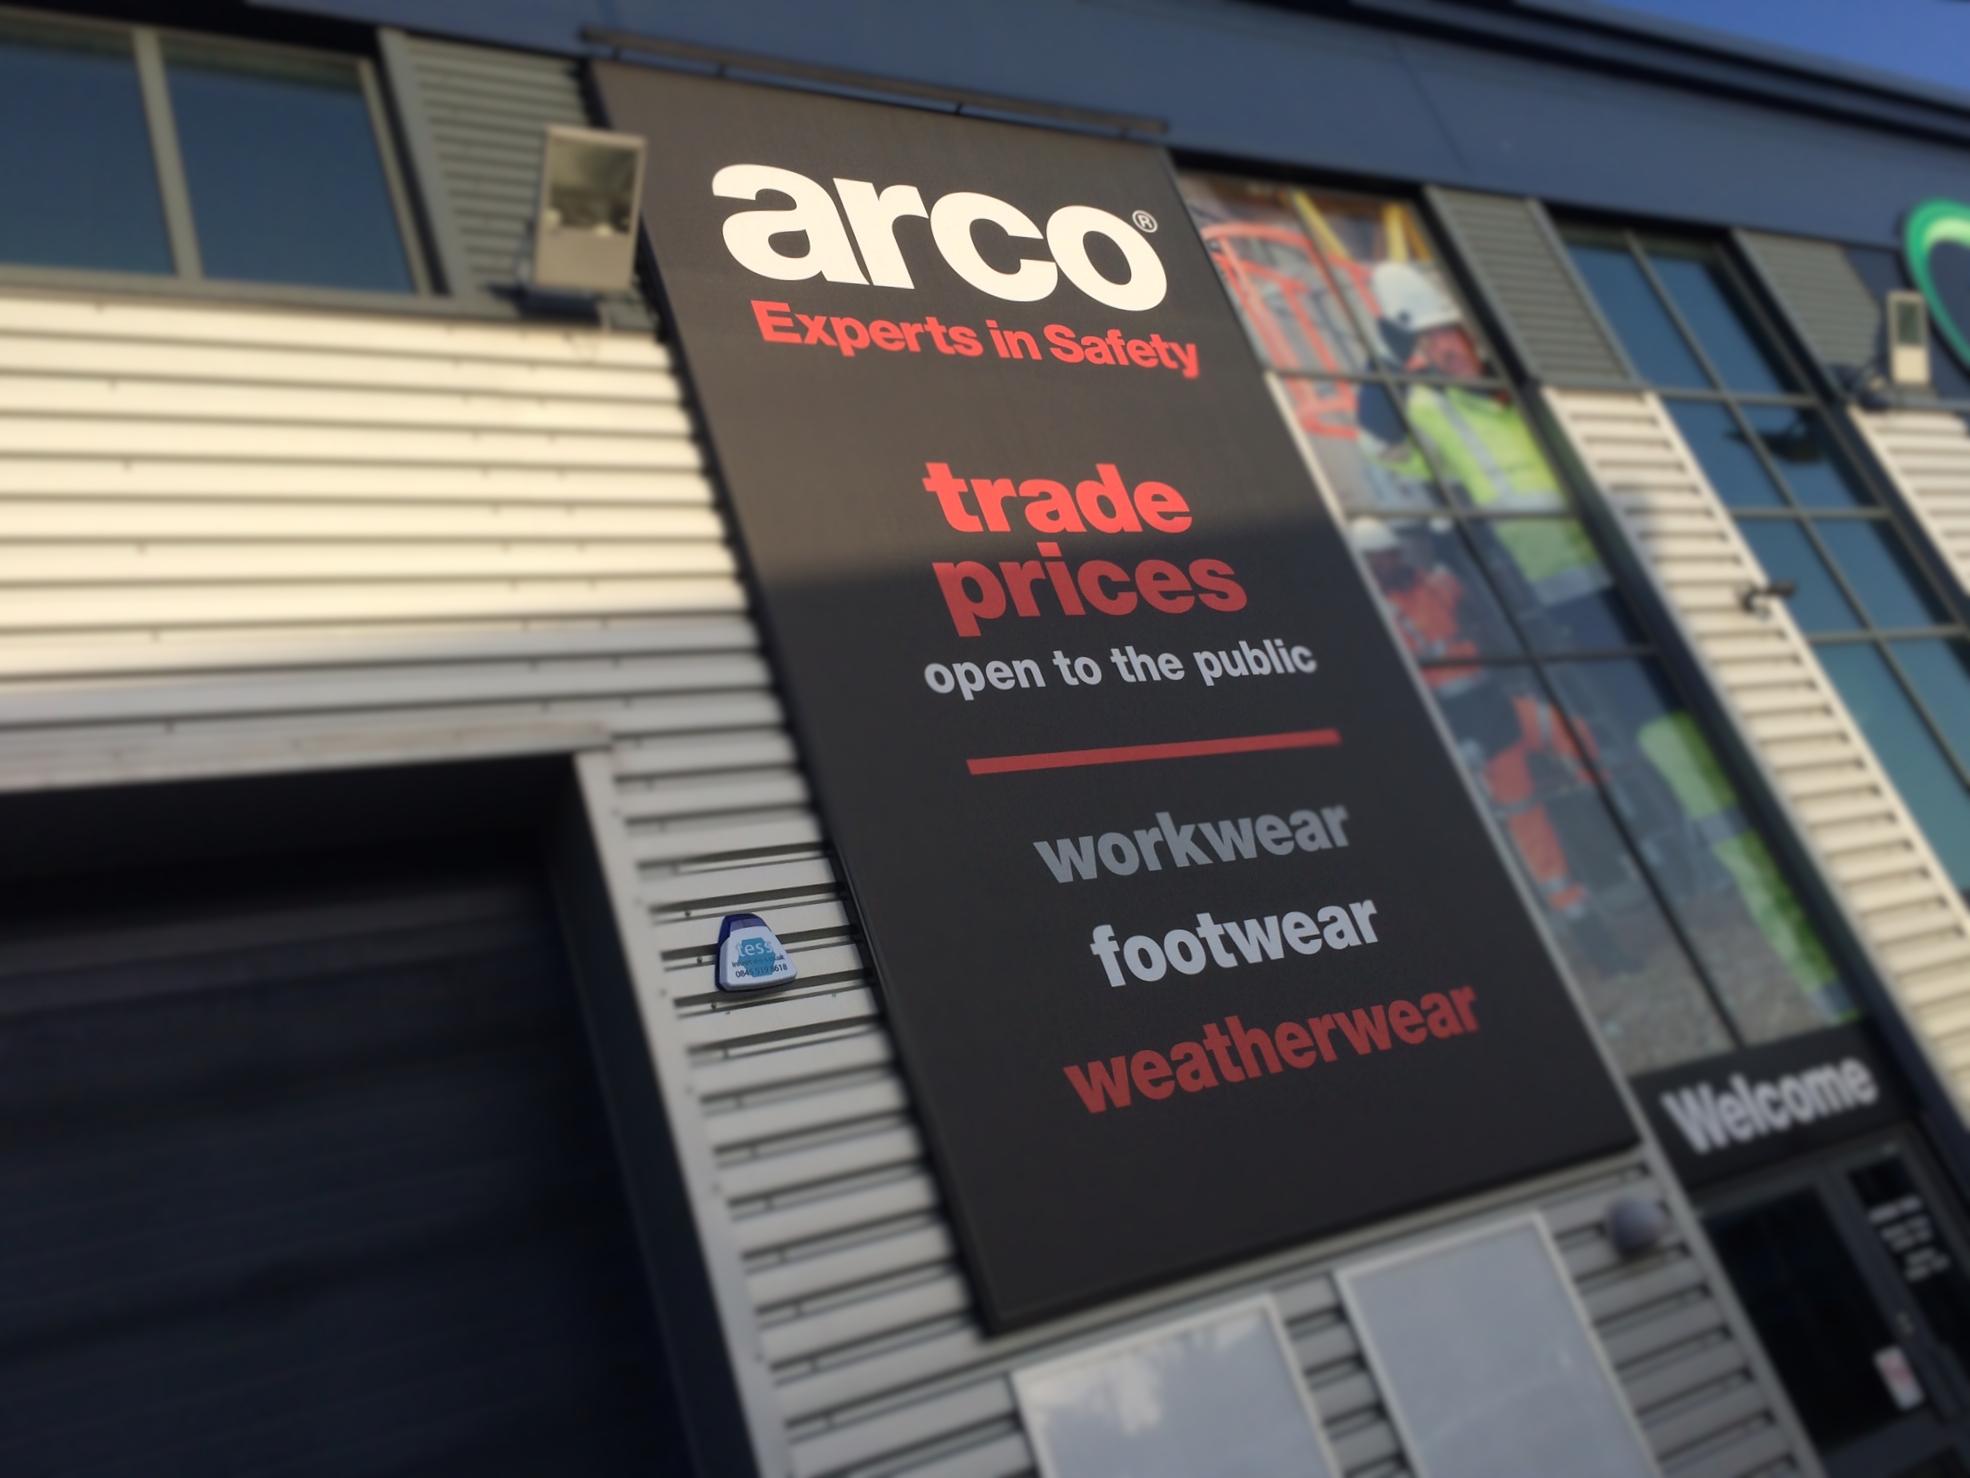 Arco - Recruitment solutions